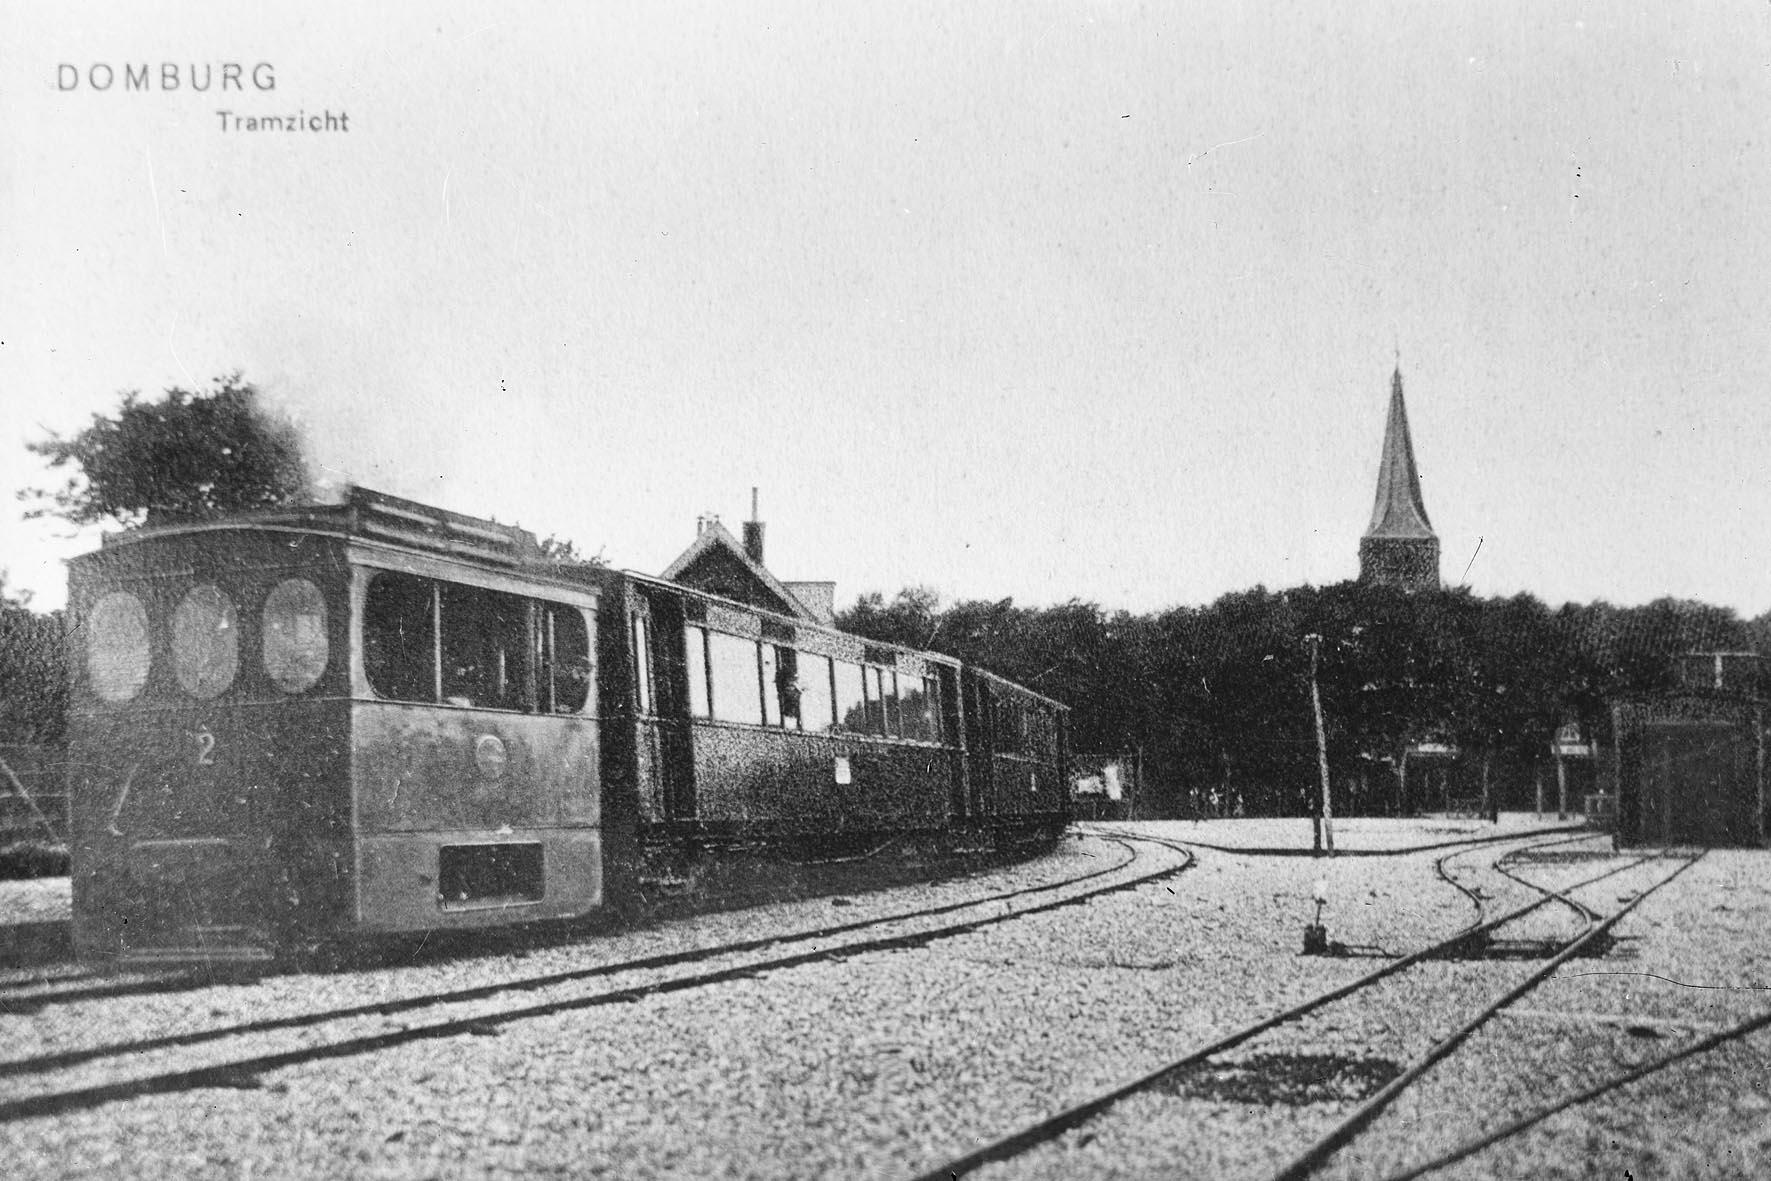 Tram_Domburg_1928